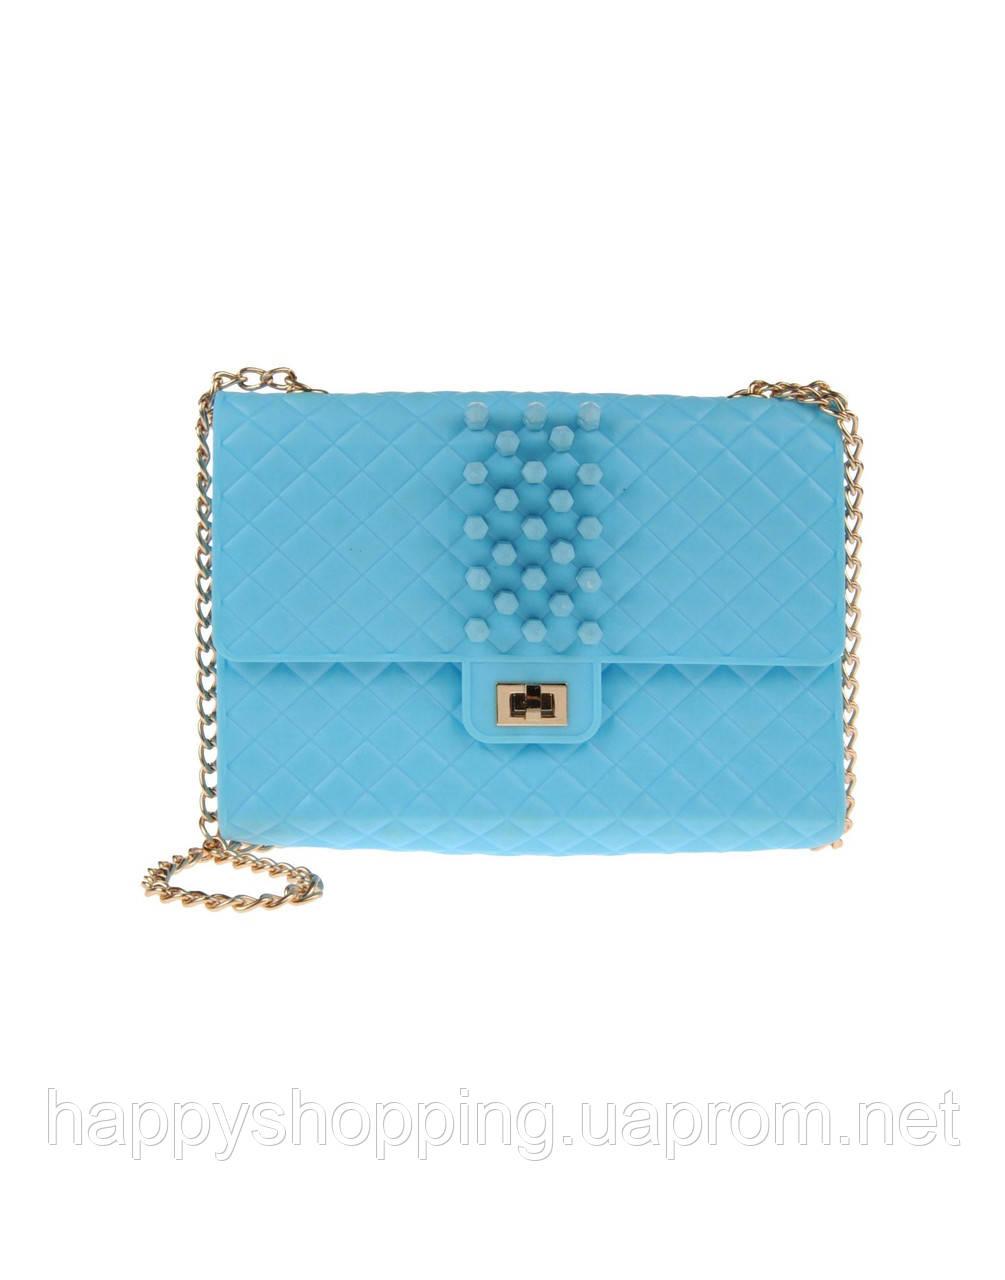 Голубая сумочка DUE DI PICCHE